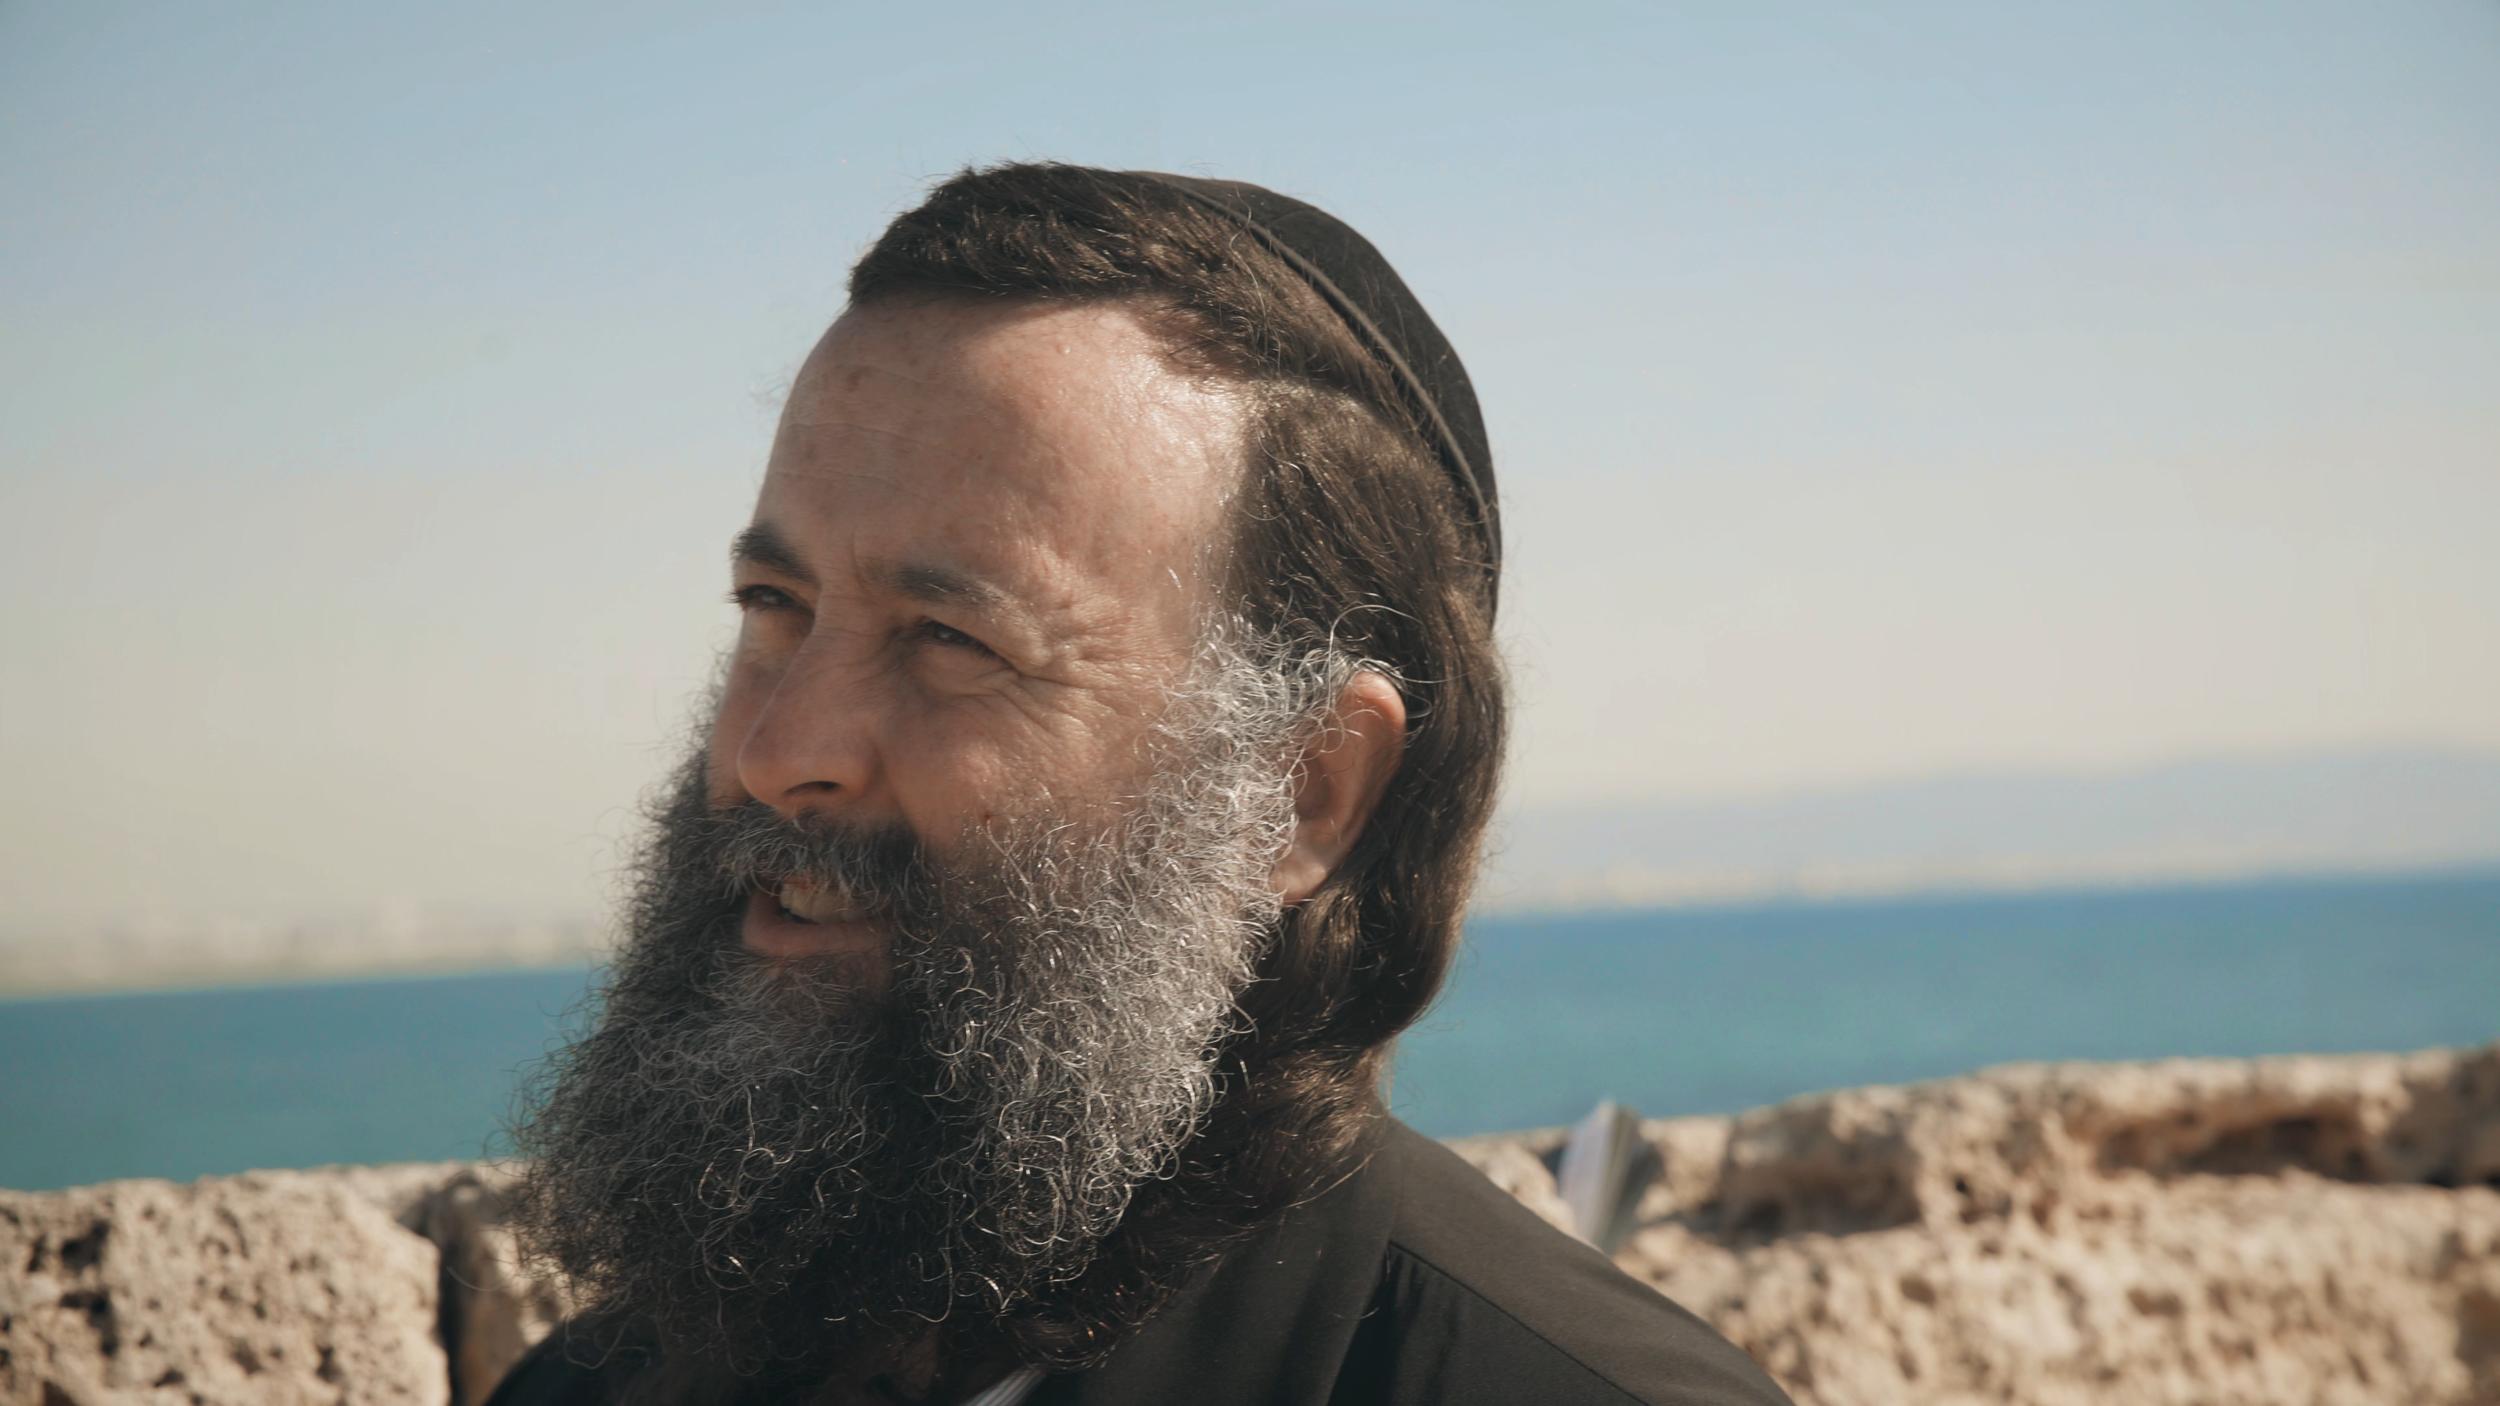 Copy of Rodef Shalom Eliyahu McLean